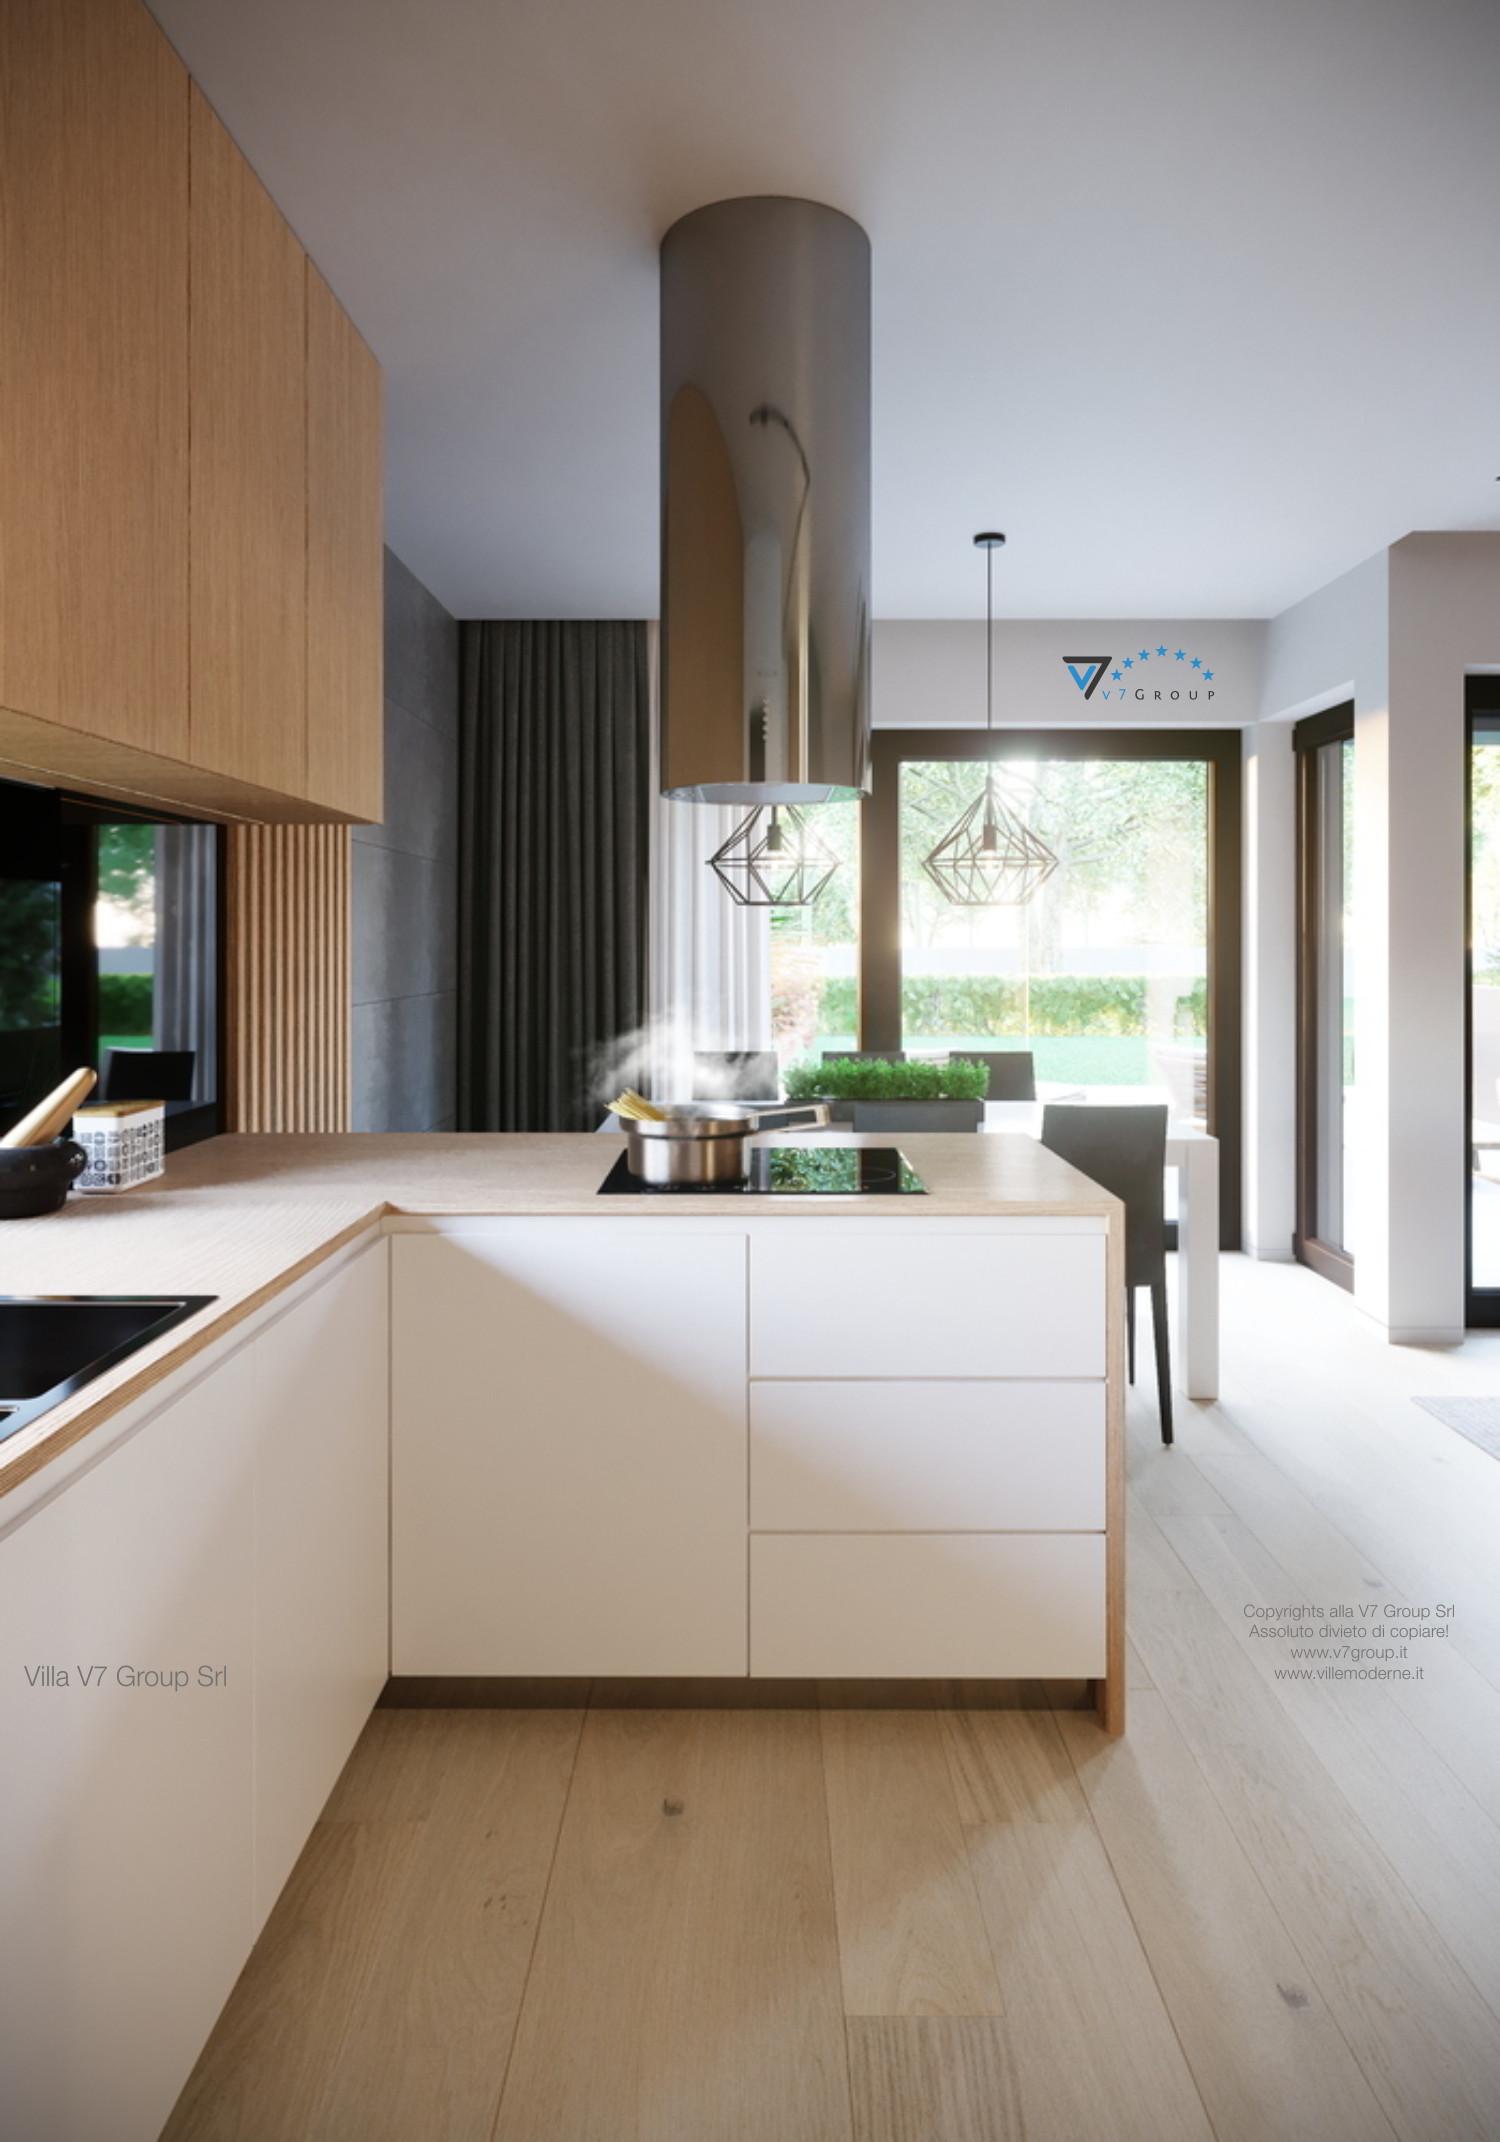 Immagine Villa V52 (B2) - interno 7 - cucina